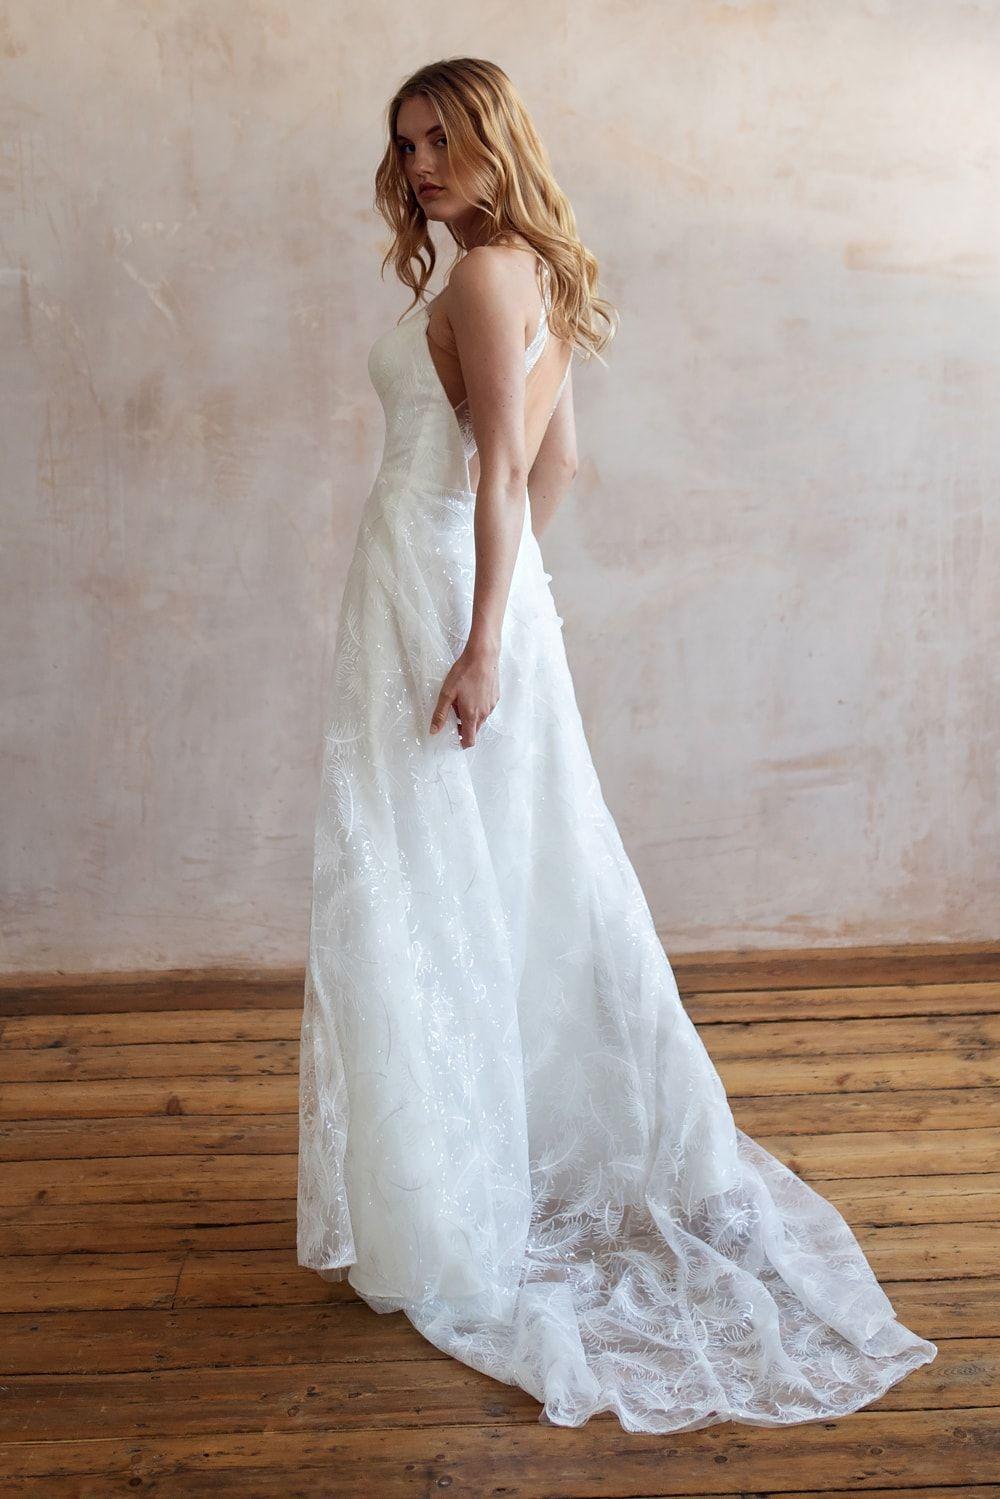 Wedding Dresses Lace Lace Wedding Dresses Wedding Dress Lace Lace Wedding Dress Wedding Dresses Boho Wedding Dress Bridal Shops London 13 5